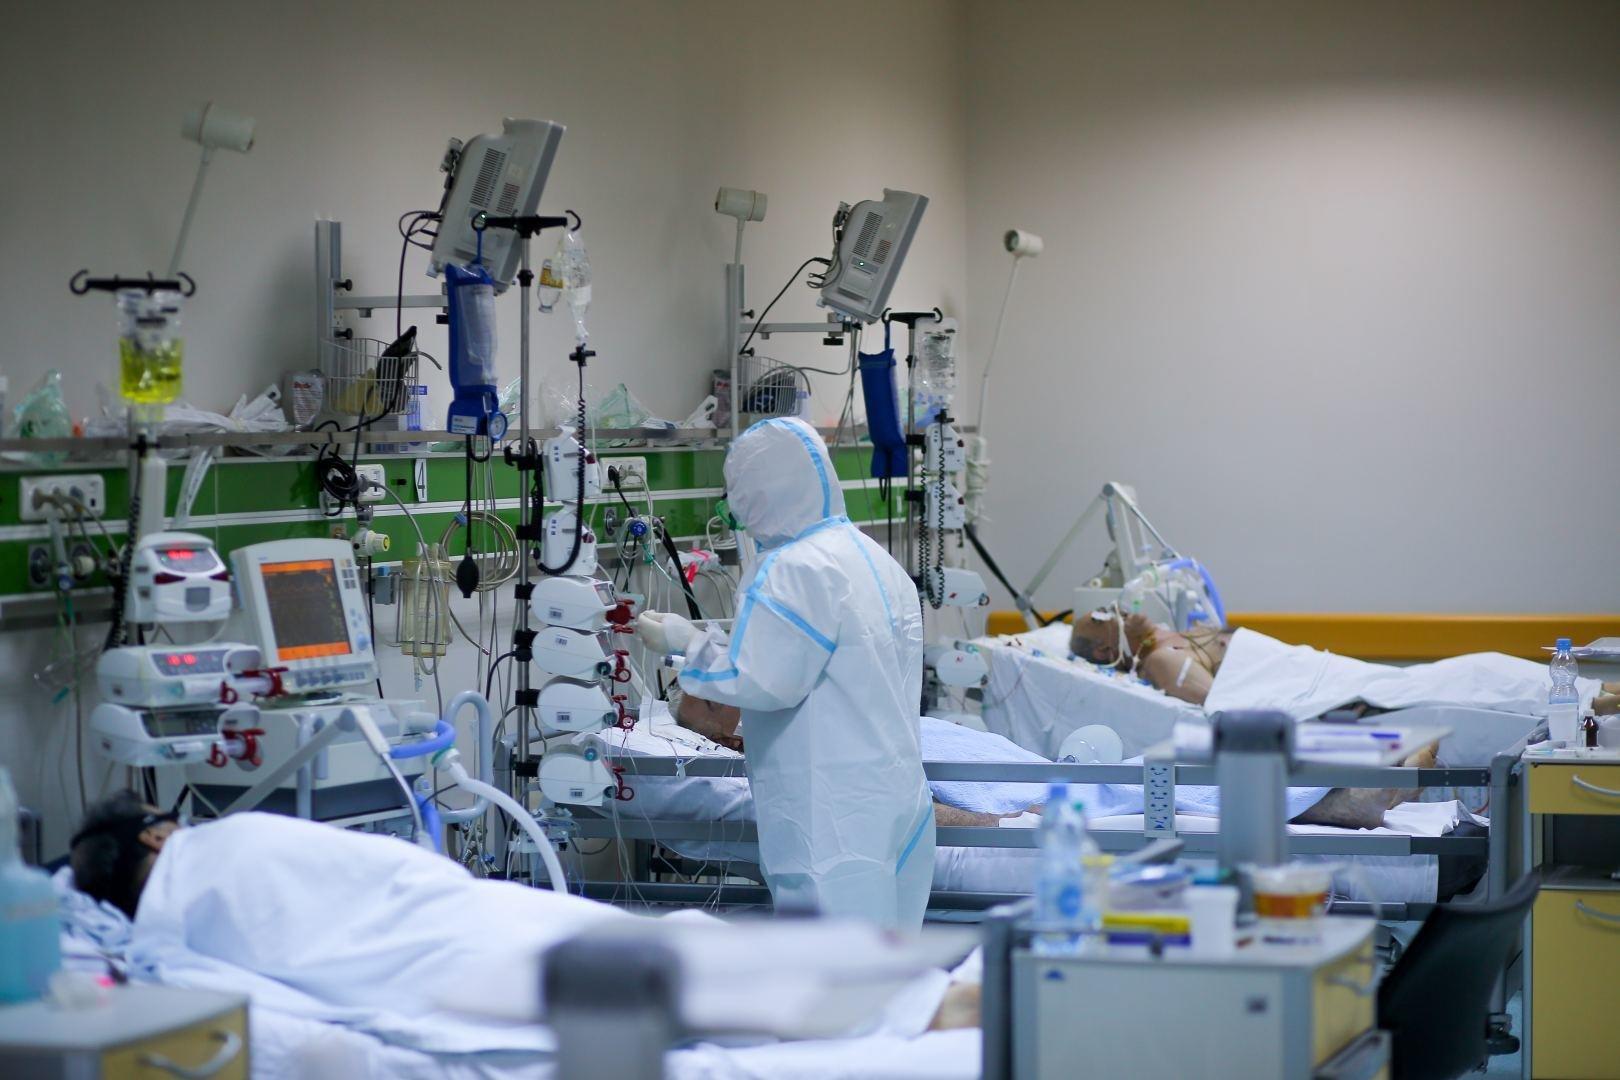 Azərbaycanda virusa yoluxanların sayında kəskin azalma - 92 yoluxma, 1 ölüm